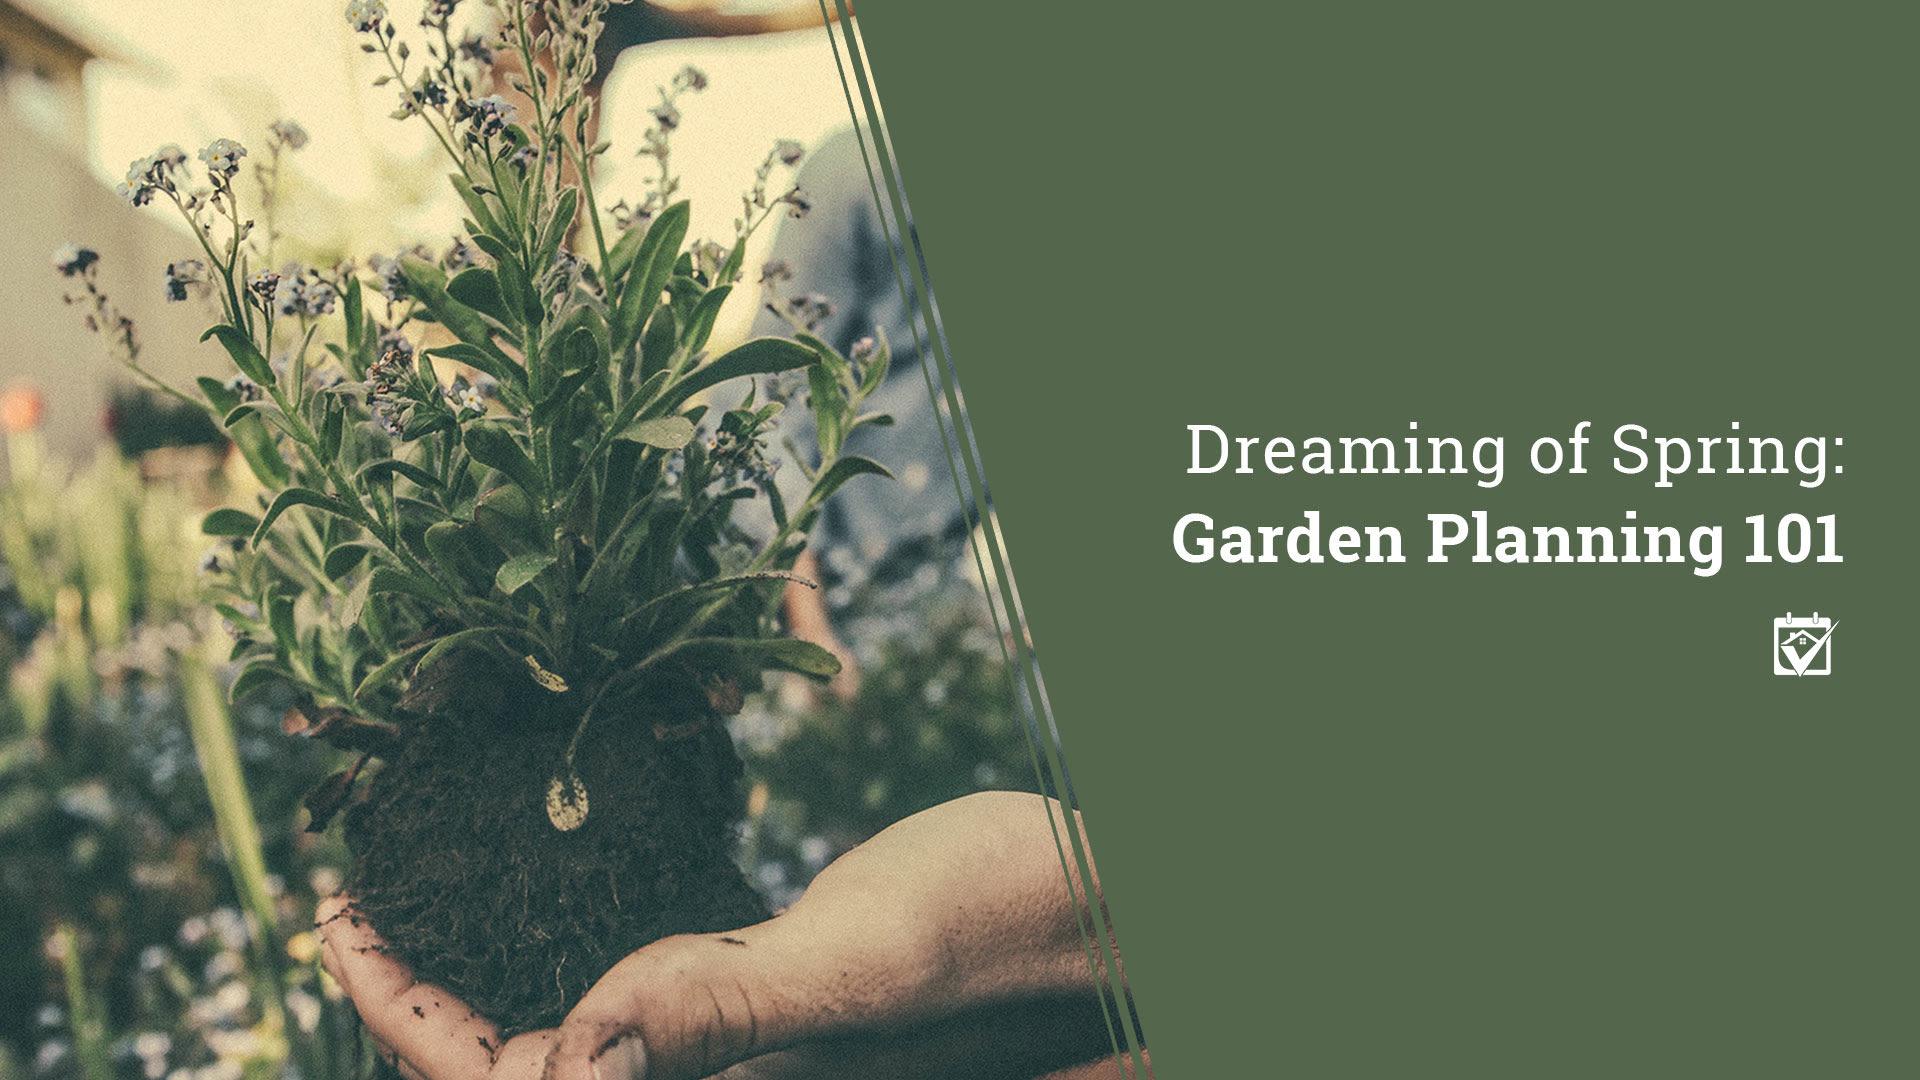 Dreaming of Spring: Garden Planning 101